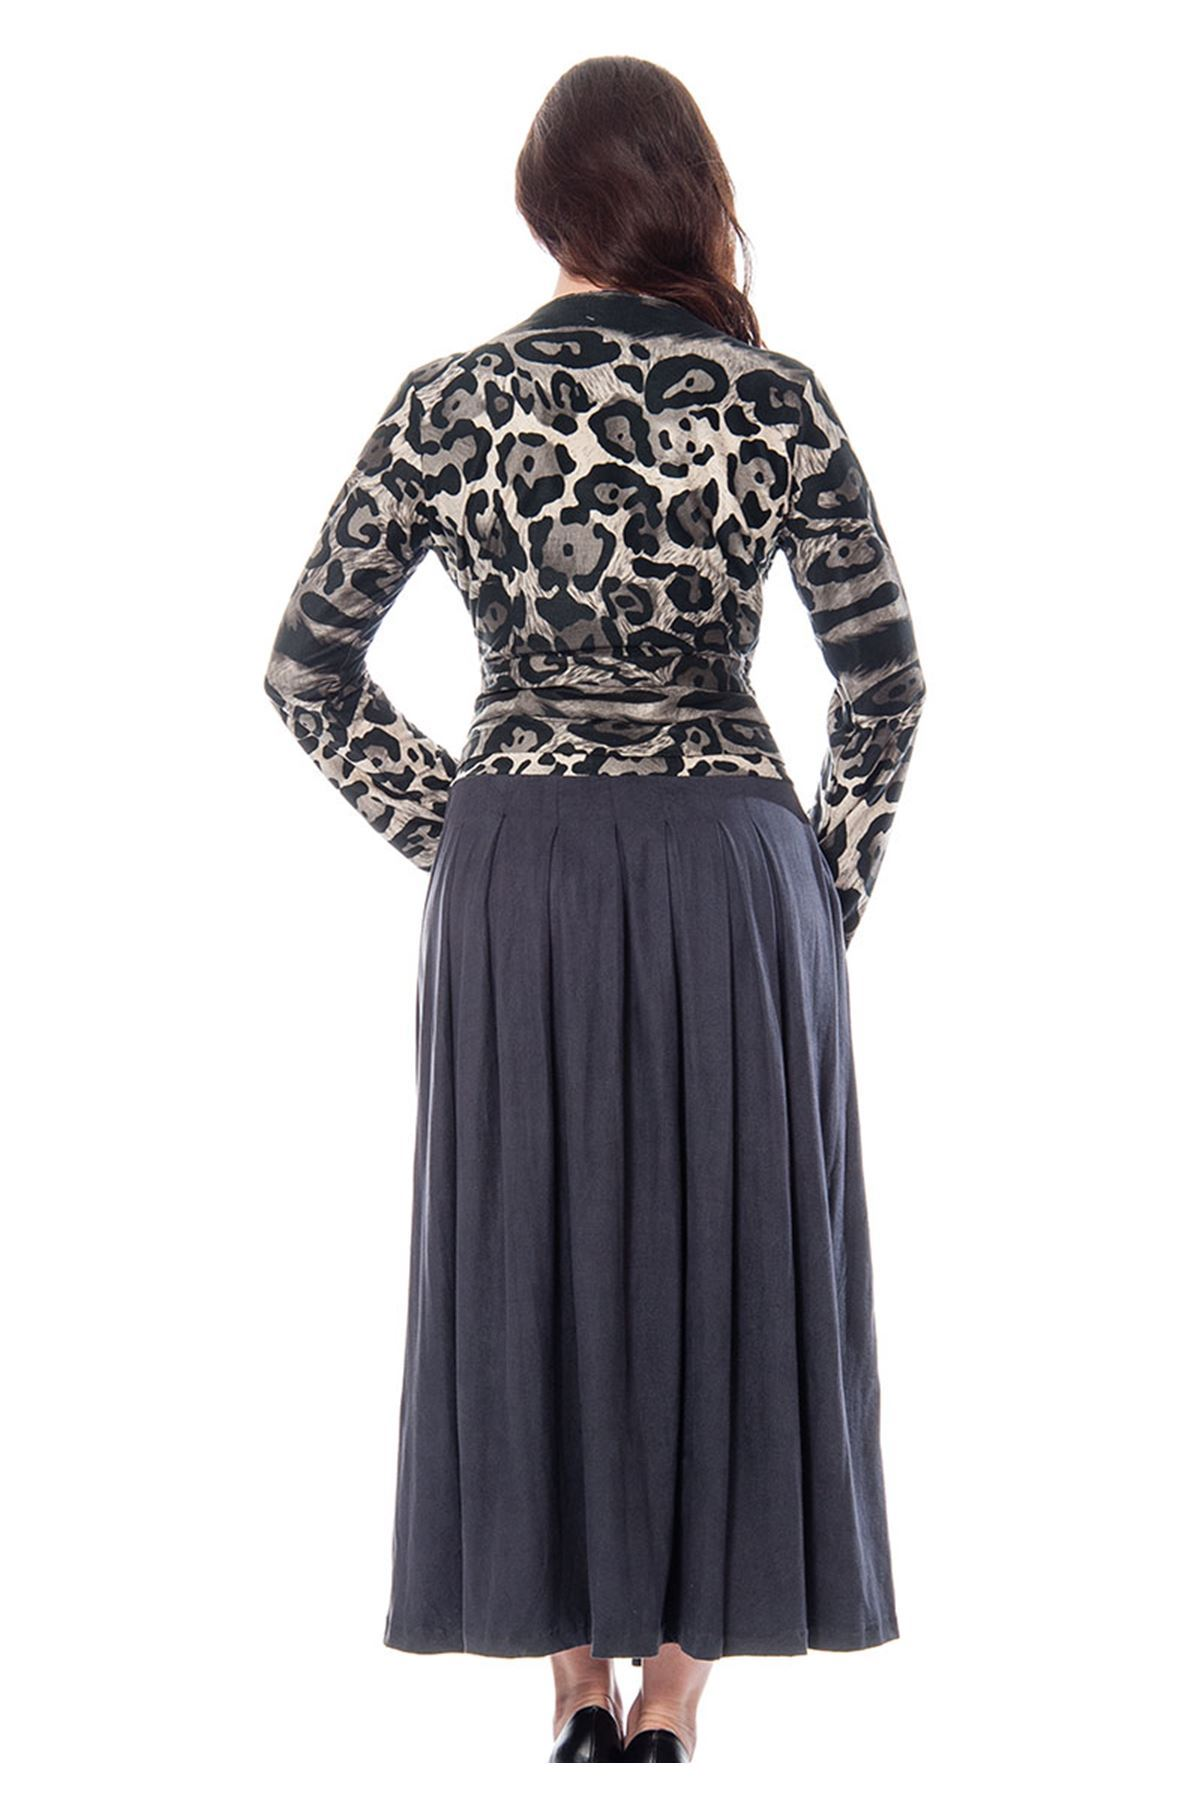 Füme Desenli Nubuk Elbise G9-110795